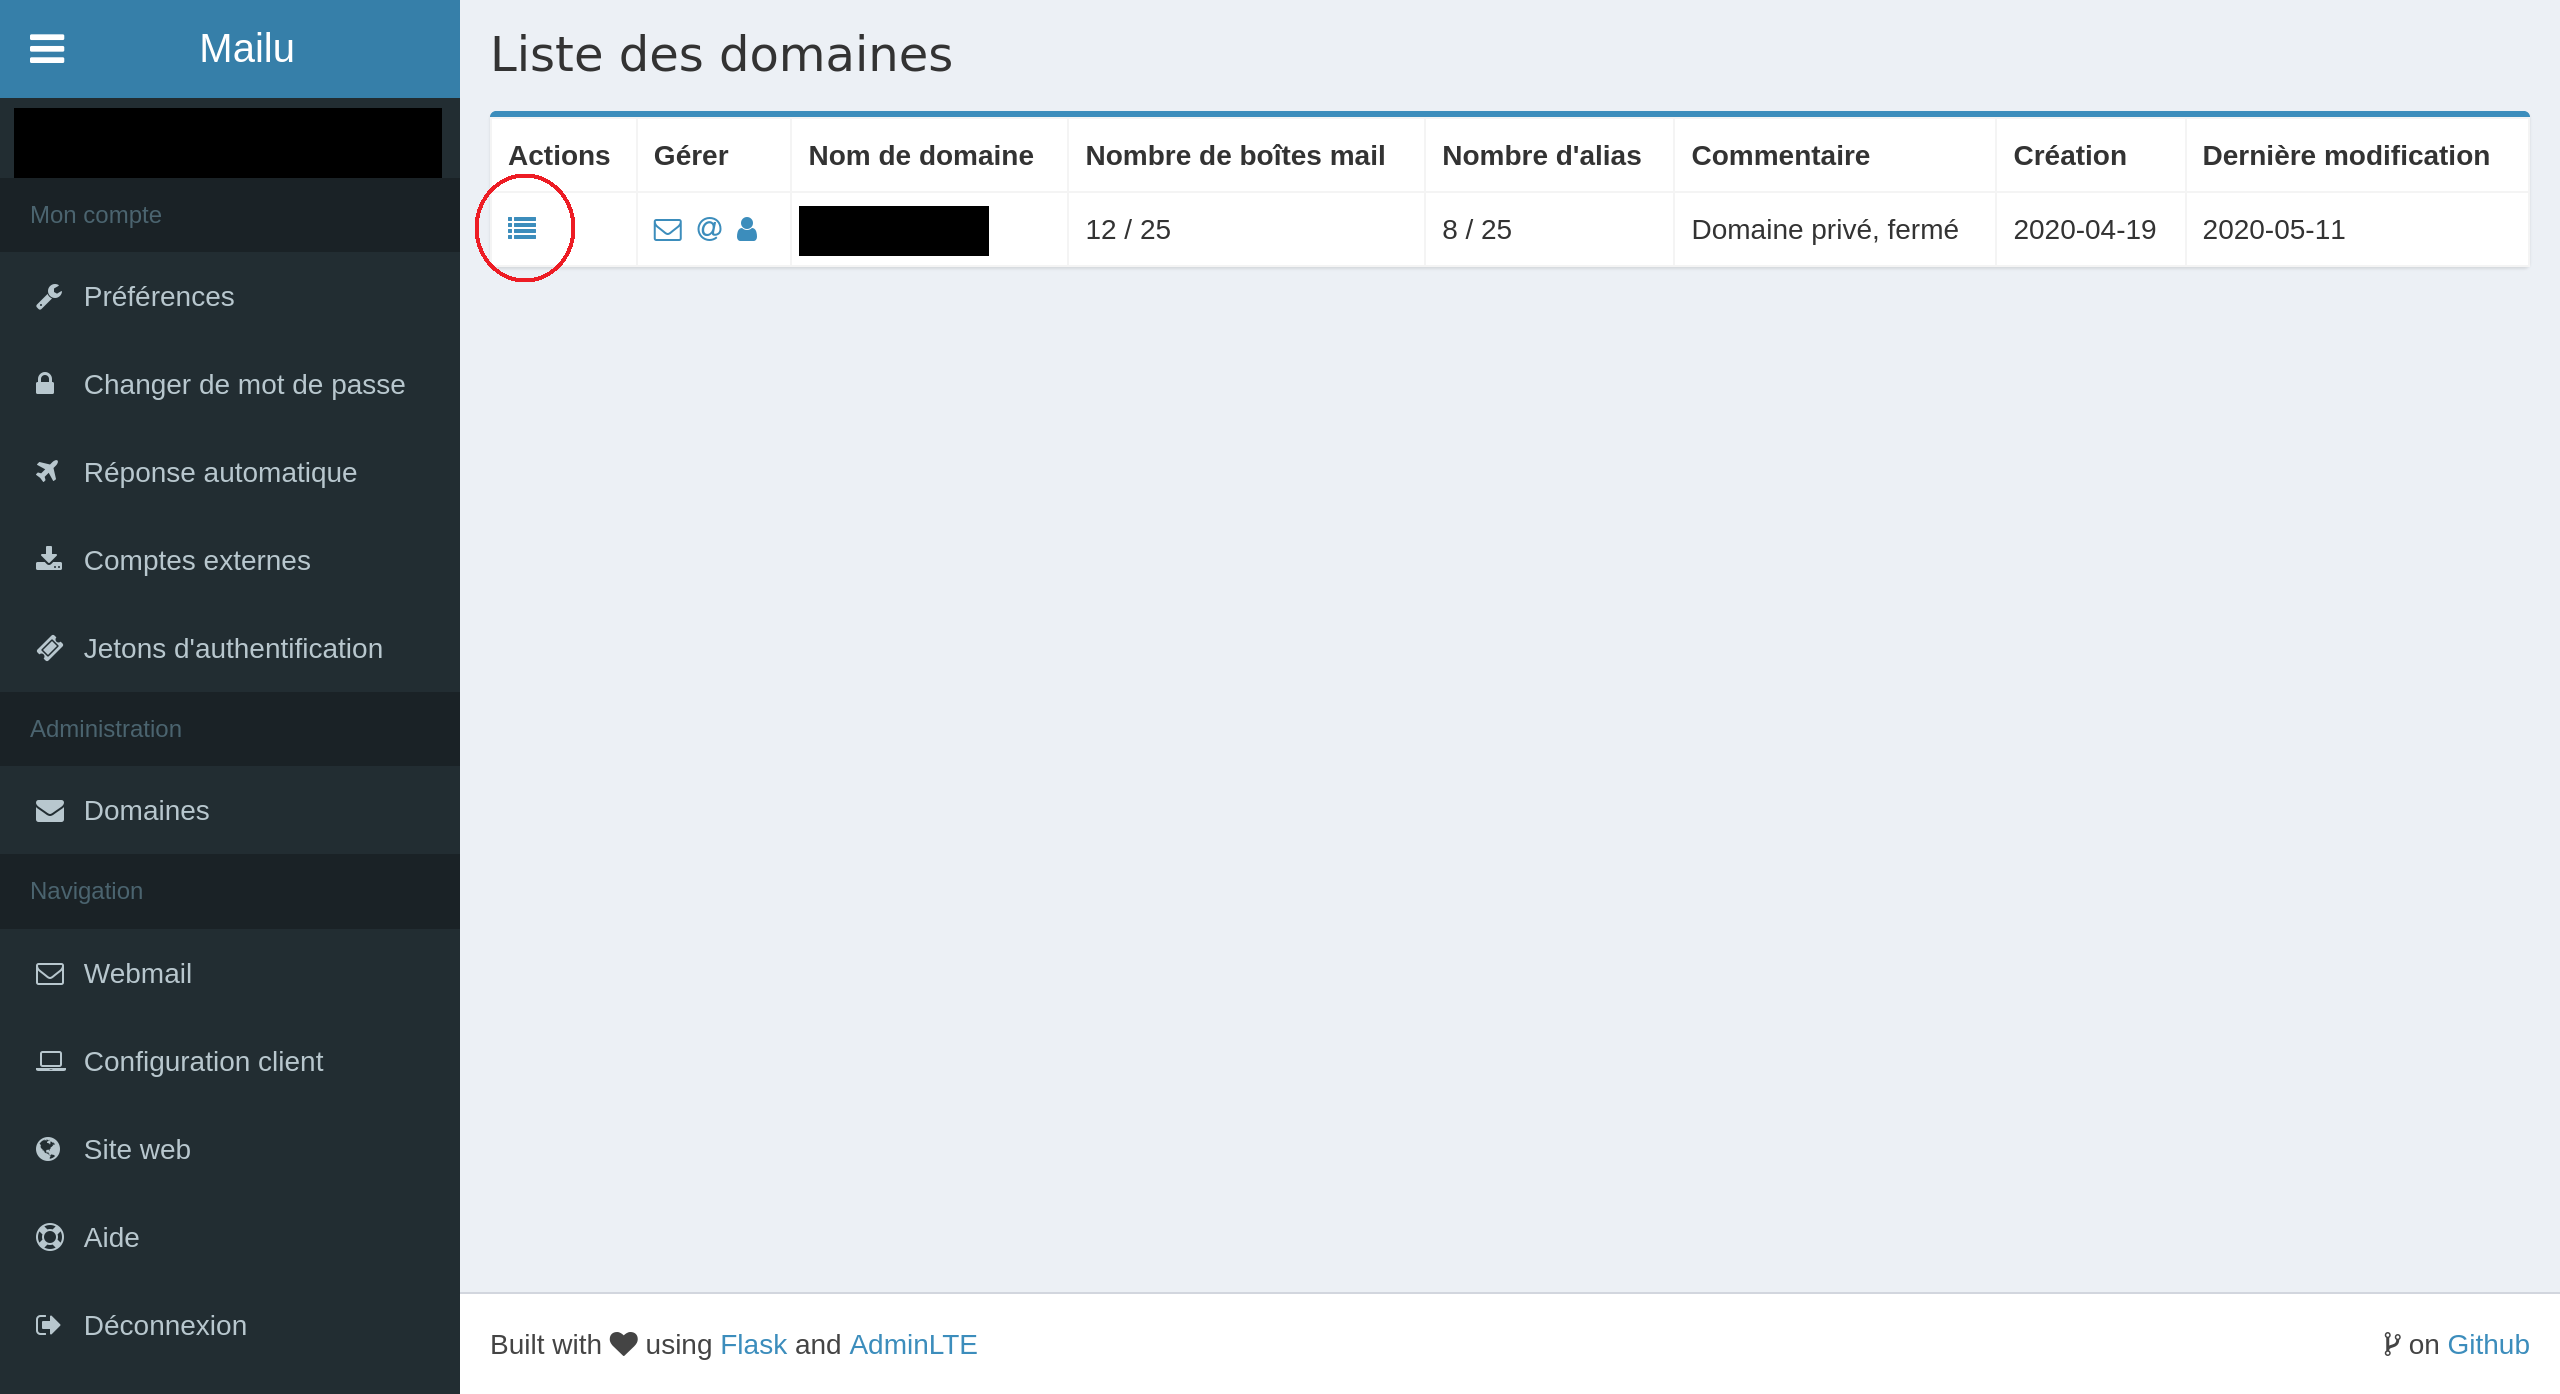 content/service/mailu/images/domain2.png